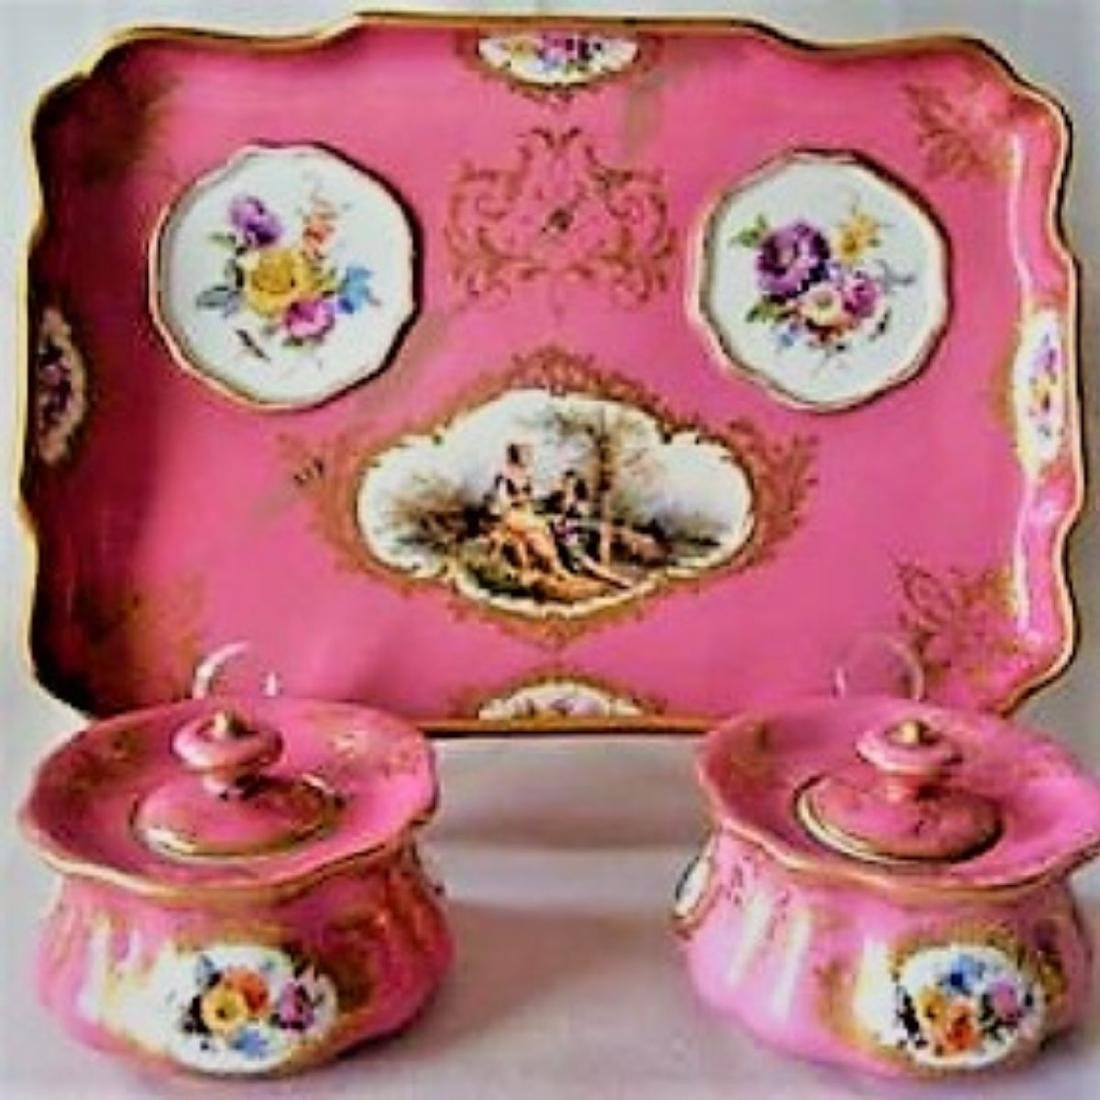 ANTIQUE MEISSEN DRESSER TRAY & JARS SET, PINK WATTEAU,